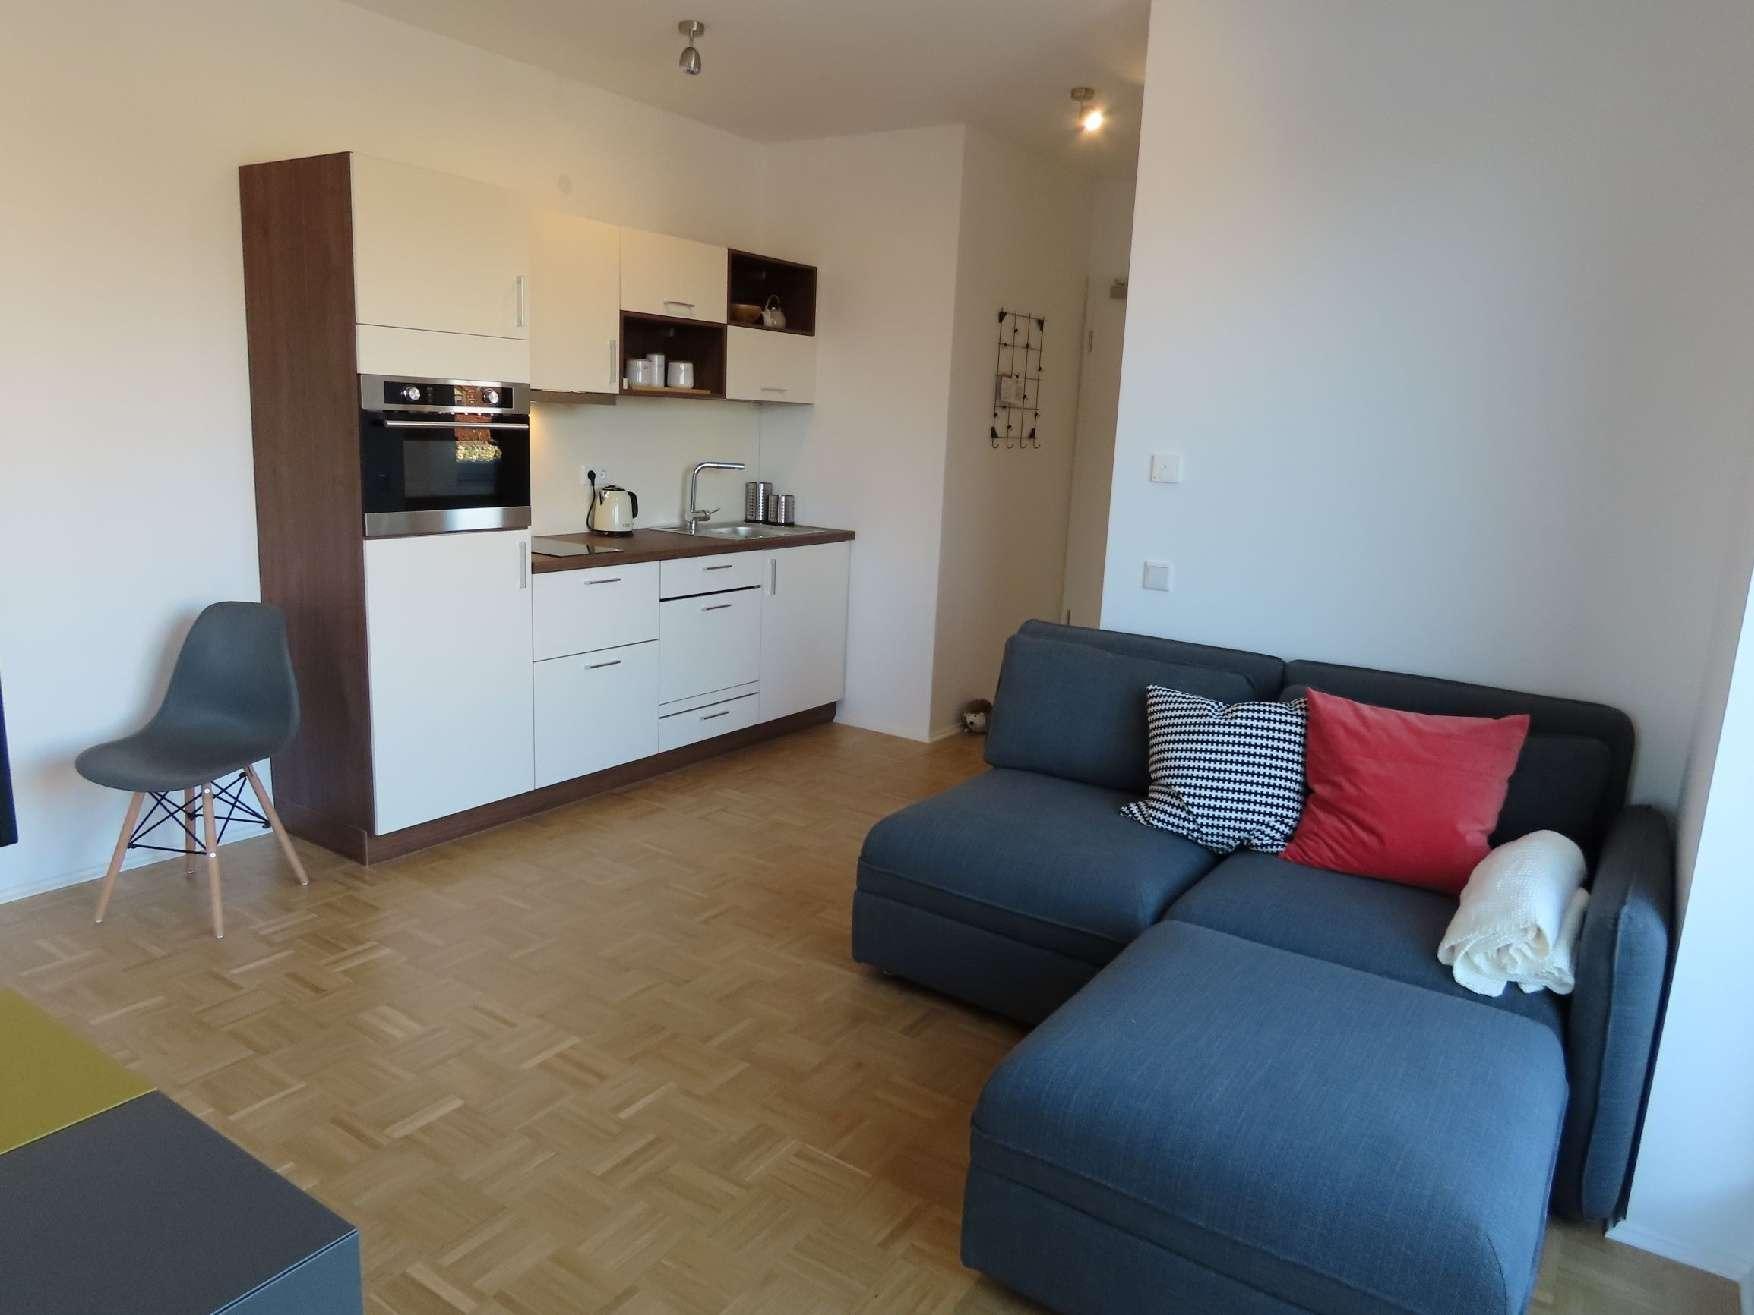 Erstbezug: 2-Zimmer-Apartment - Vollmobiliert in Südwest (Ingolstadt)